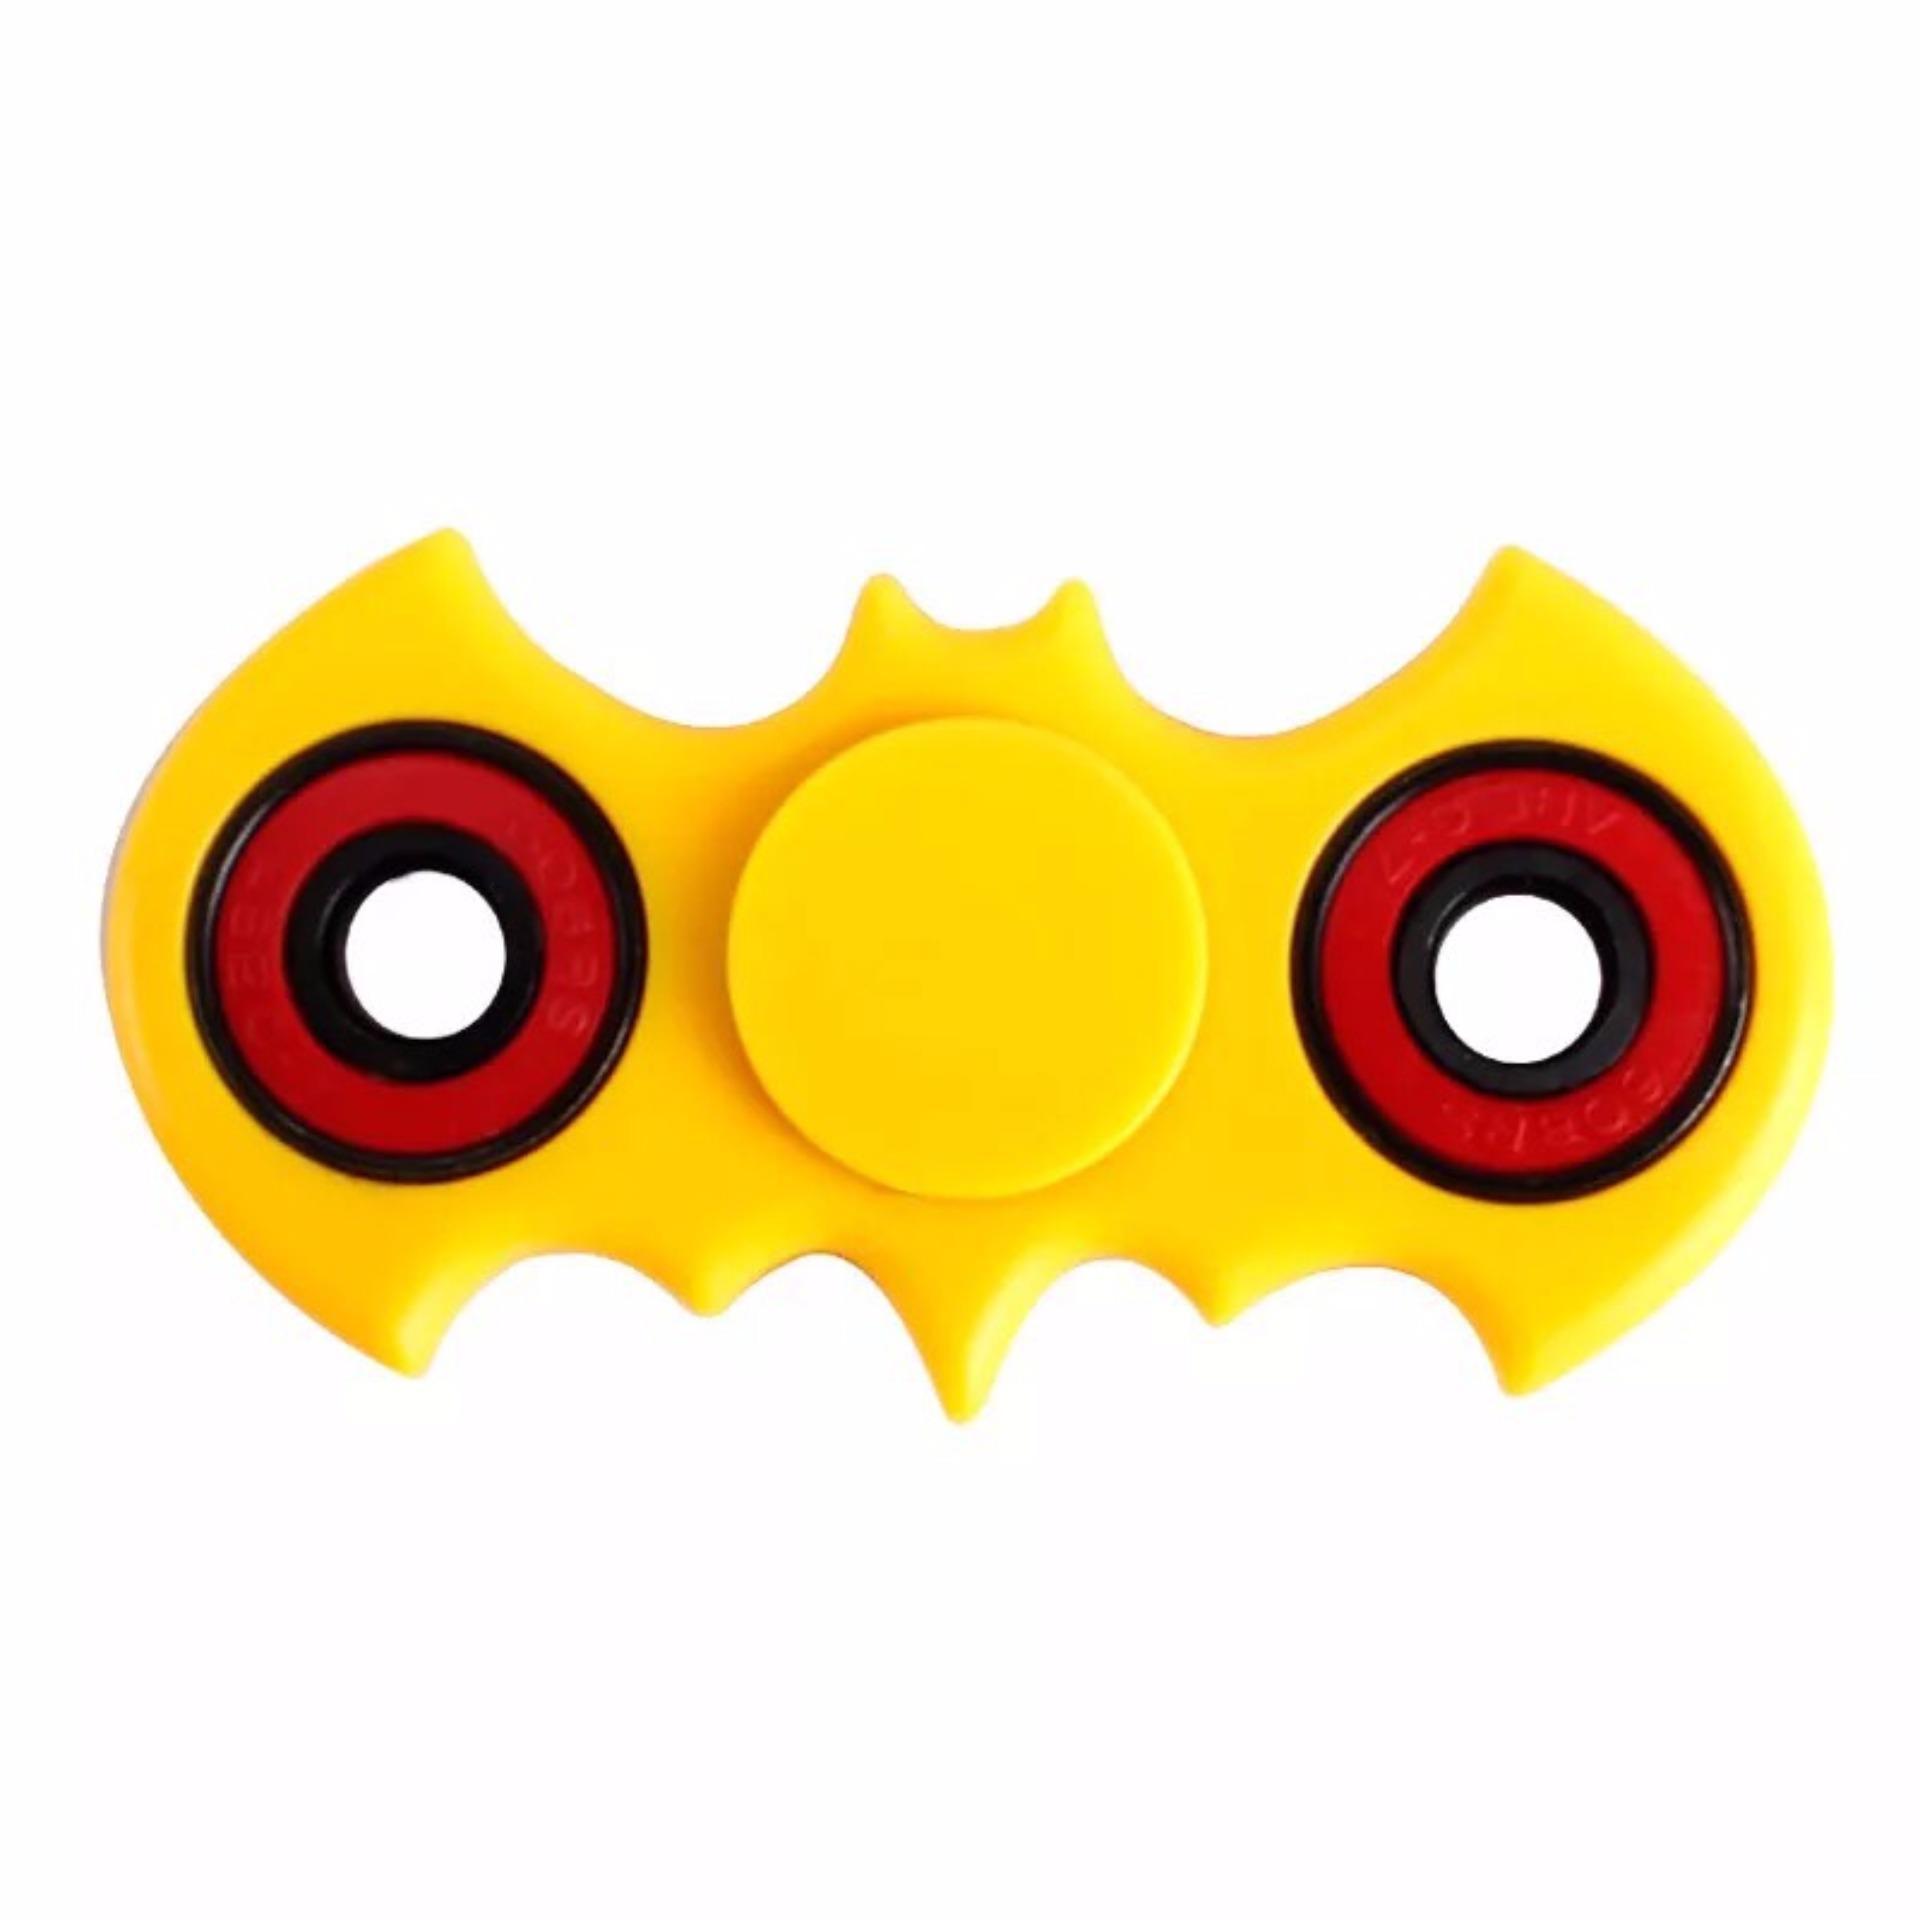 ... Batman Fidget Spinner Hand Toys Mainan EDC Ceramic Ball Focus Games Batman - Kuning ...